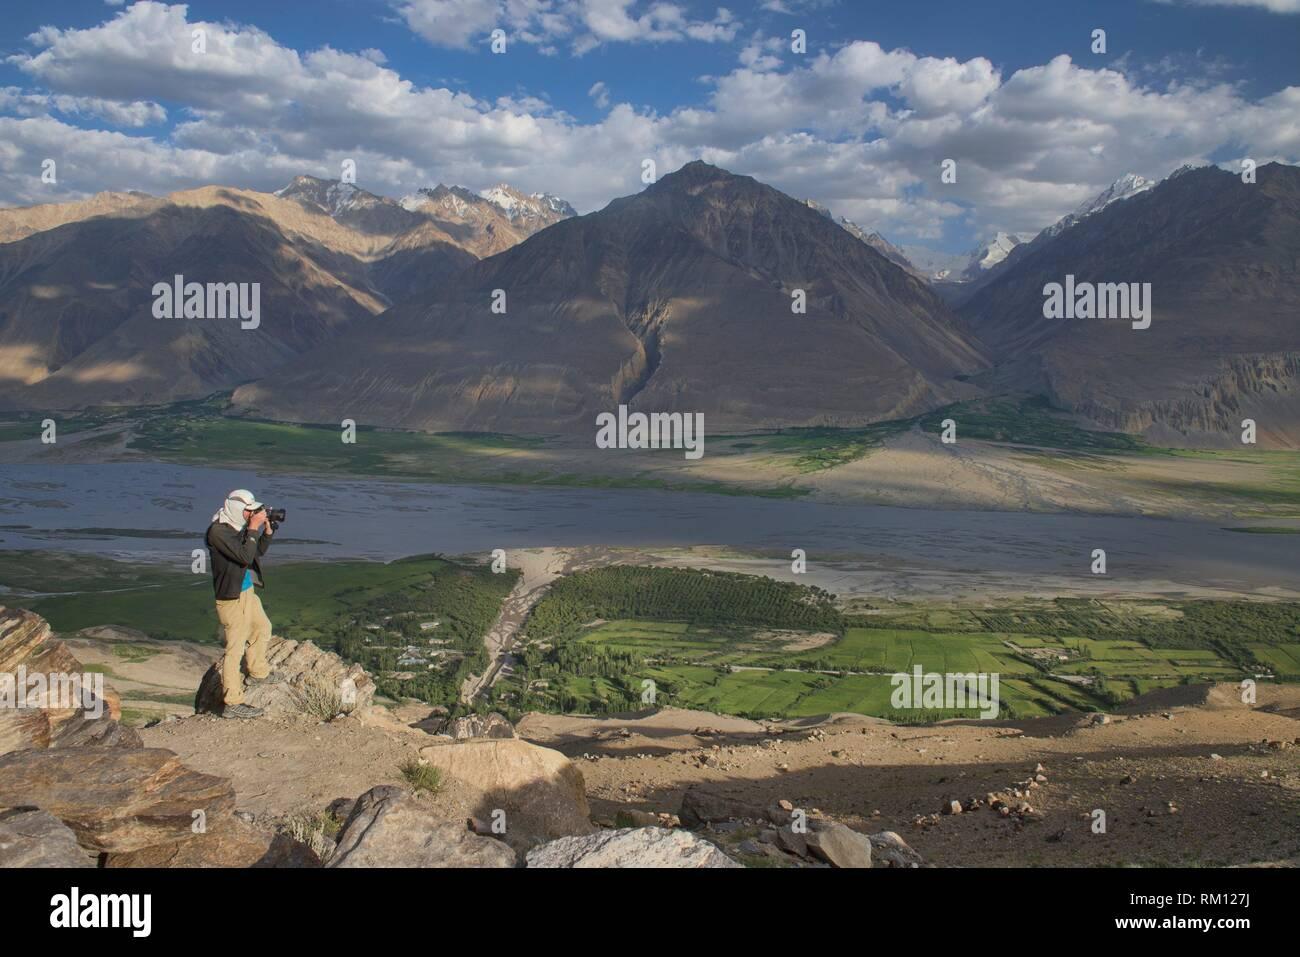 The Wakhan Valley and Afghanistan Hindu Kush, Vikchut, Tajikistan. - Stock Image